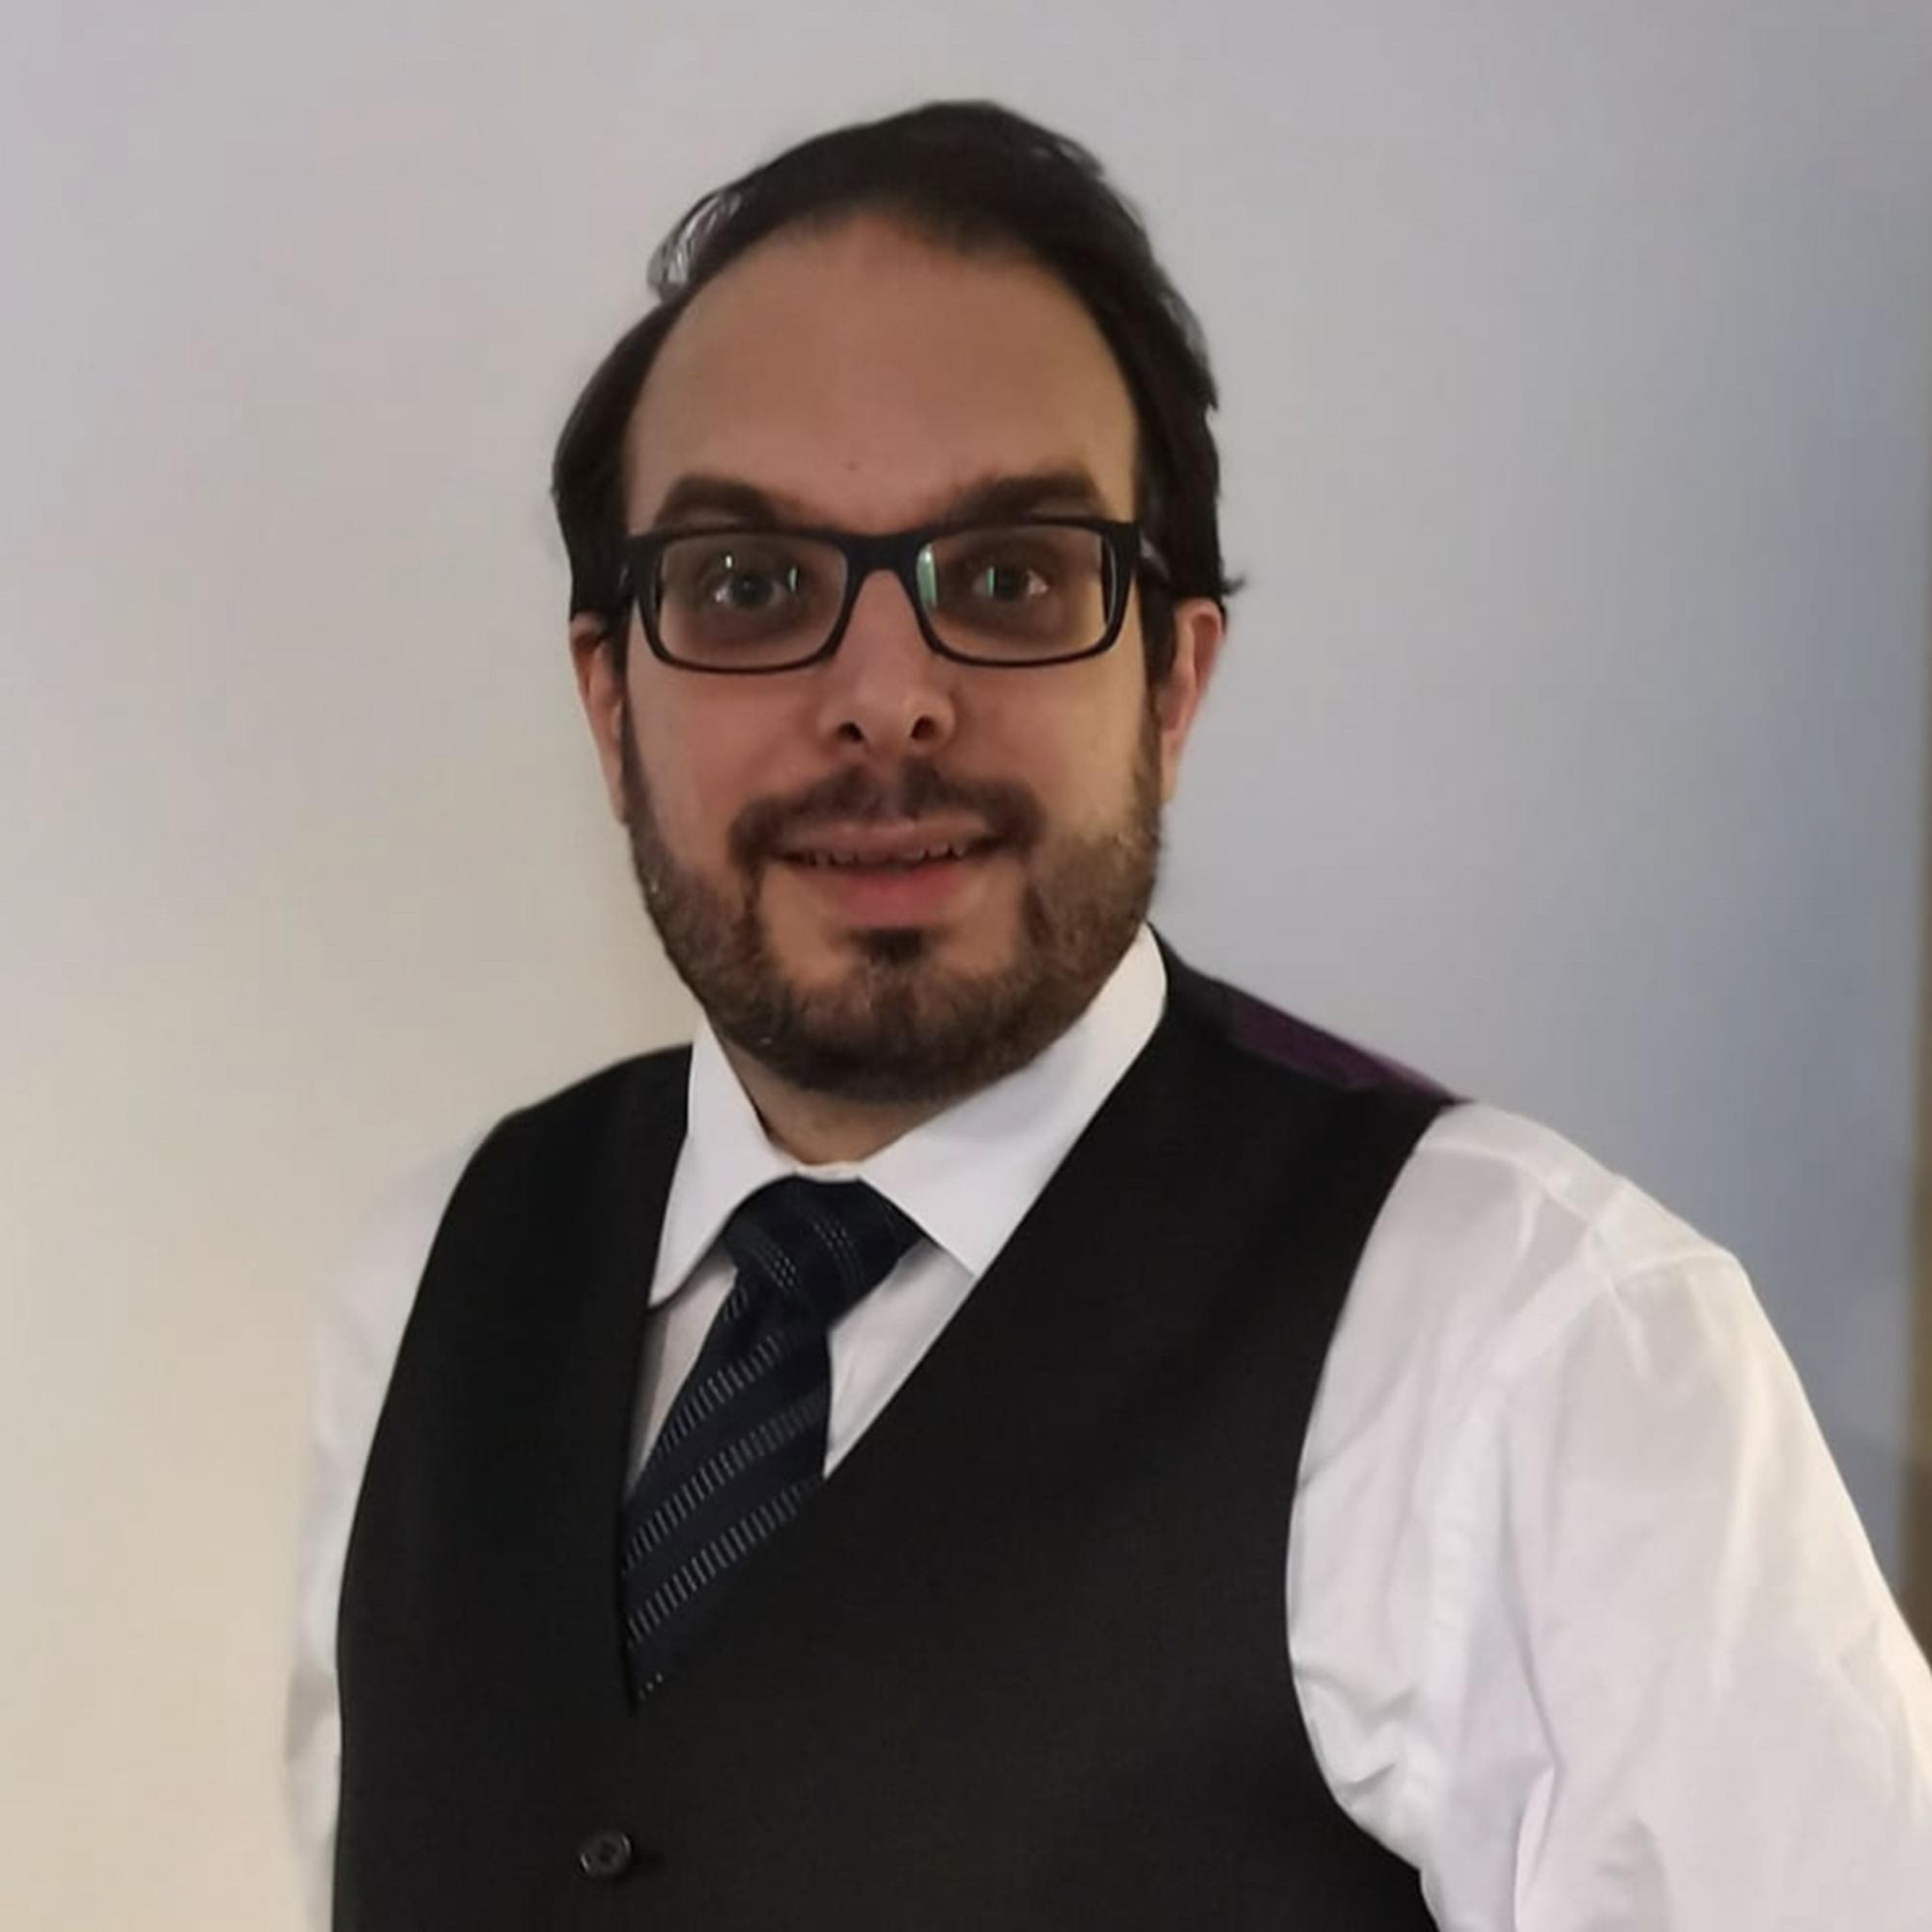 Staff profile picture of Dr Nicholas Korpelainen wearing a waist coat